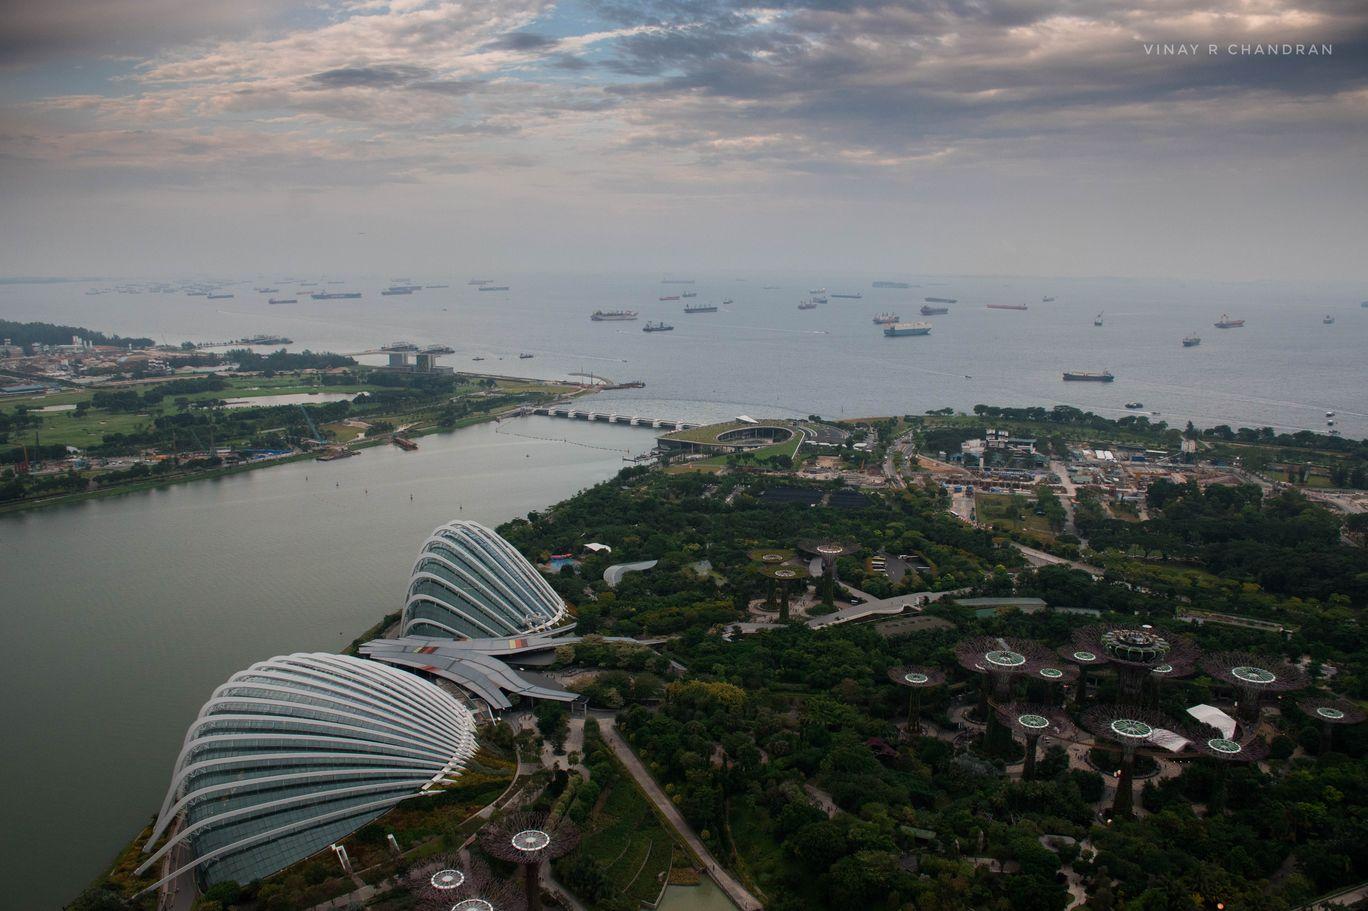 Photo of Marina Bay Sands Hotel By Vinay R Chandran